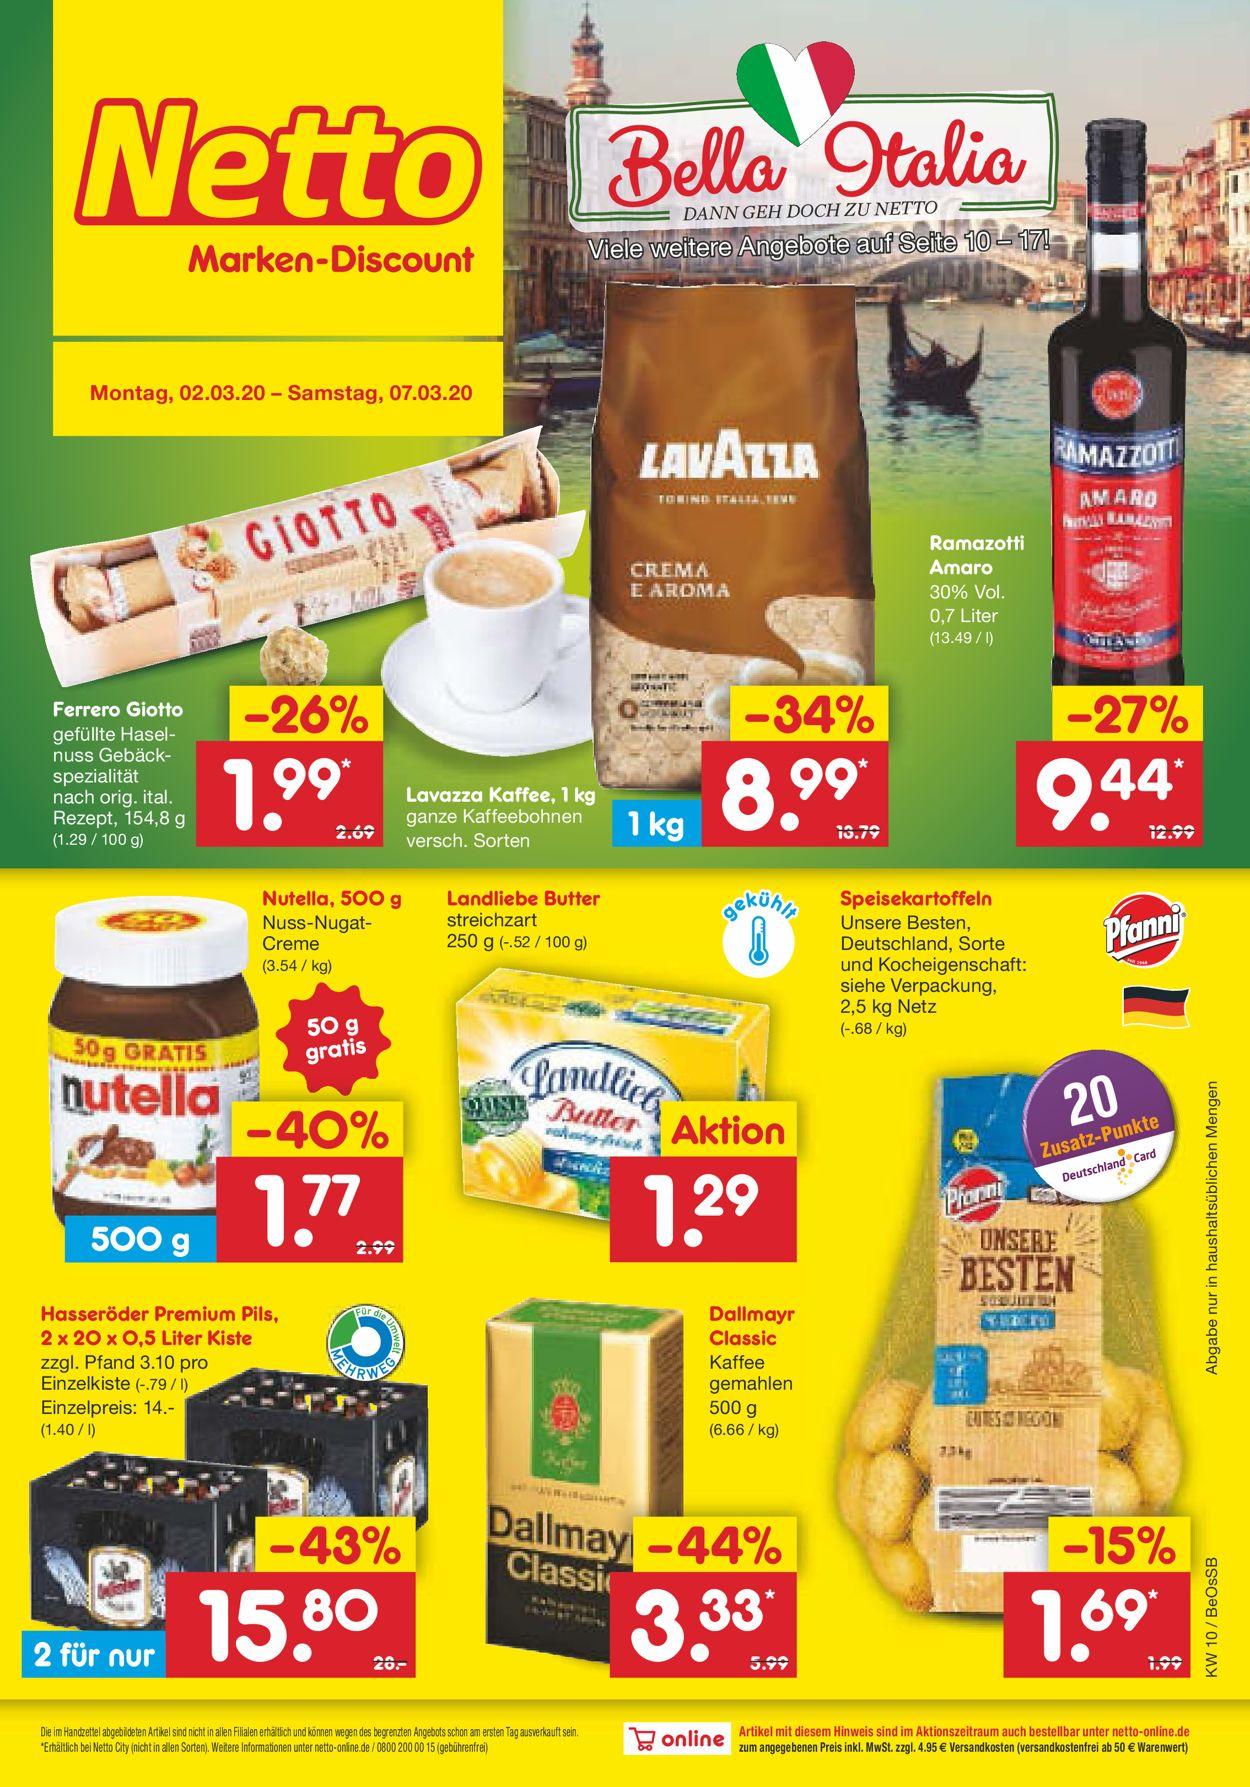 Netto Marken Discount Aktueller Prospekt 20.20   20.20.2200 ...